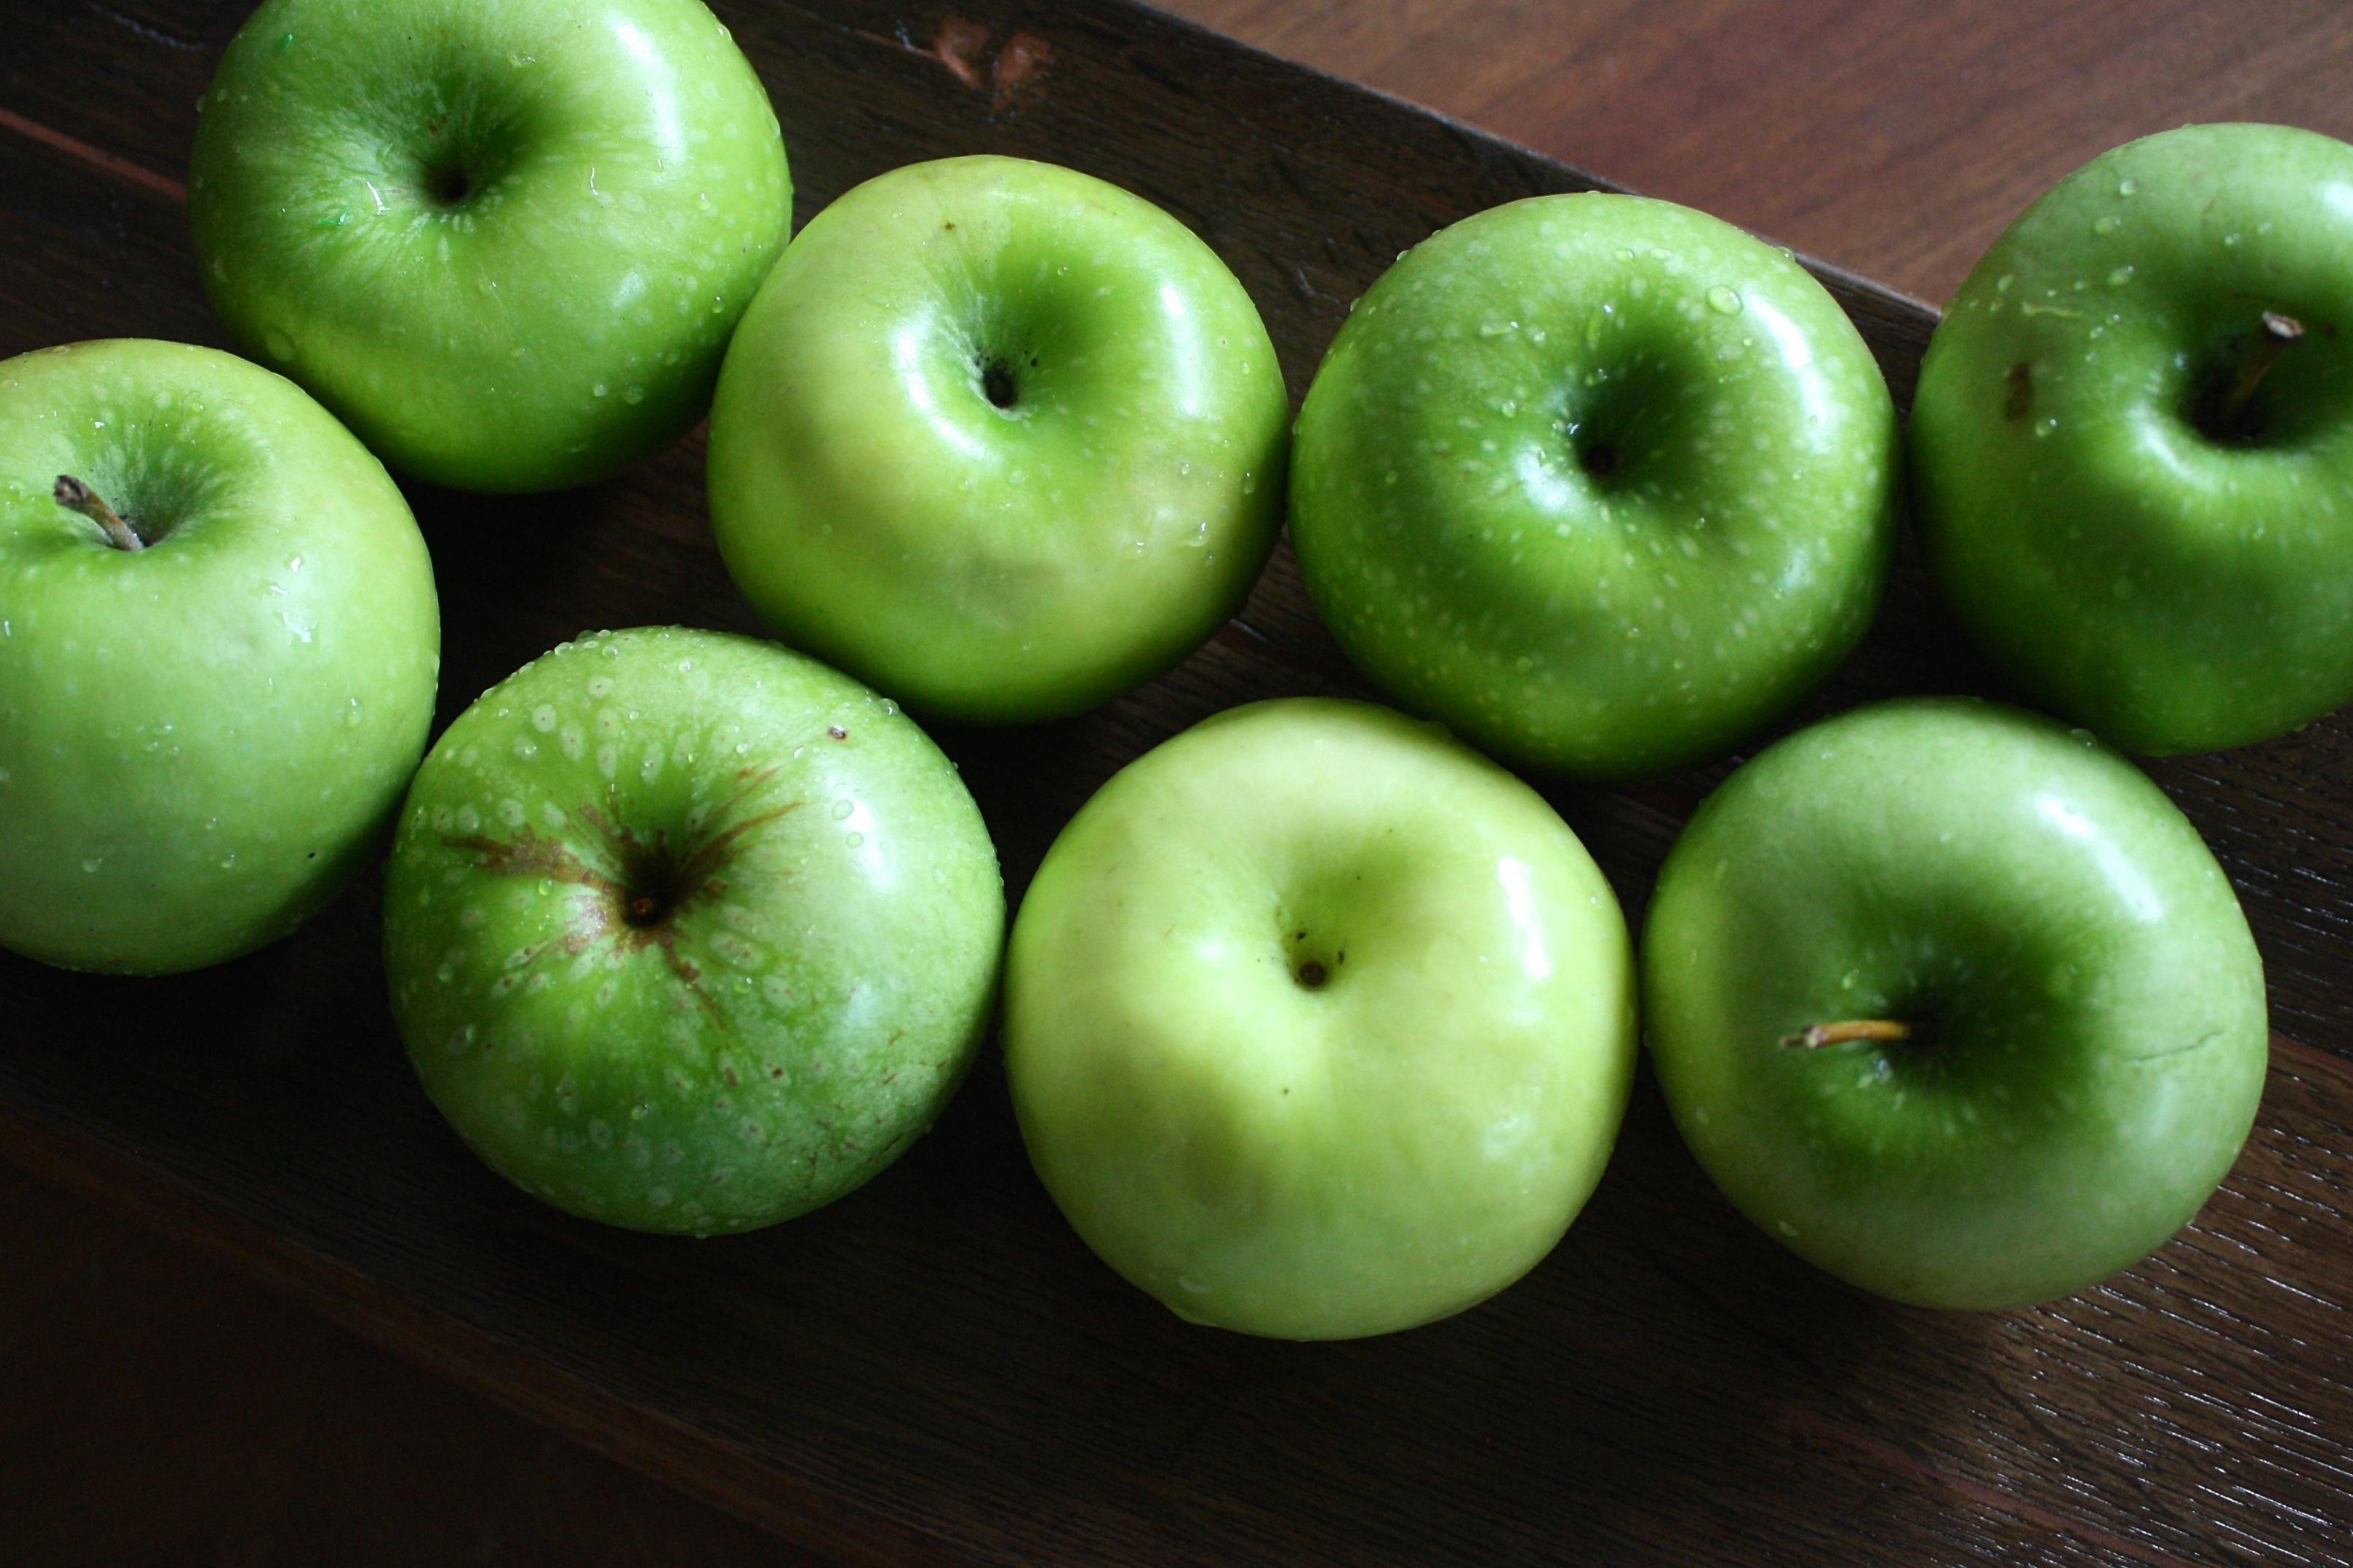 Fotos gratis : naturaleza, Fruta, dulce, maduro, comida, Produce ...